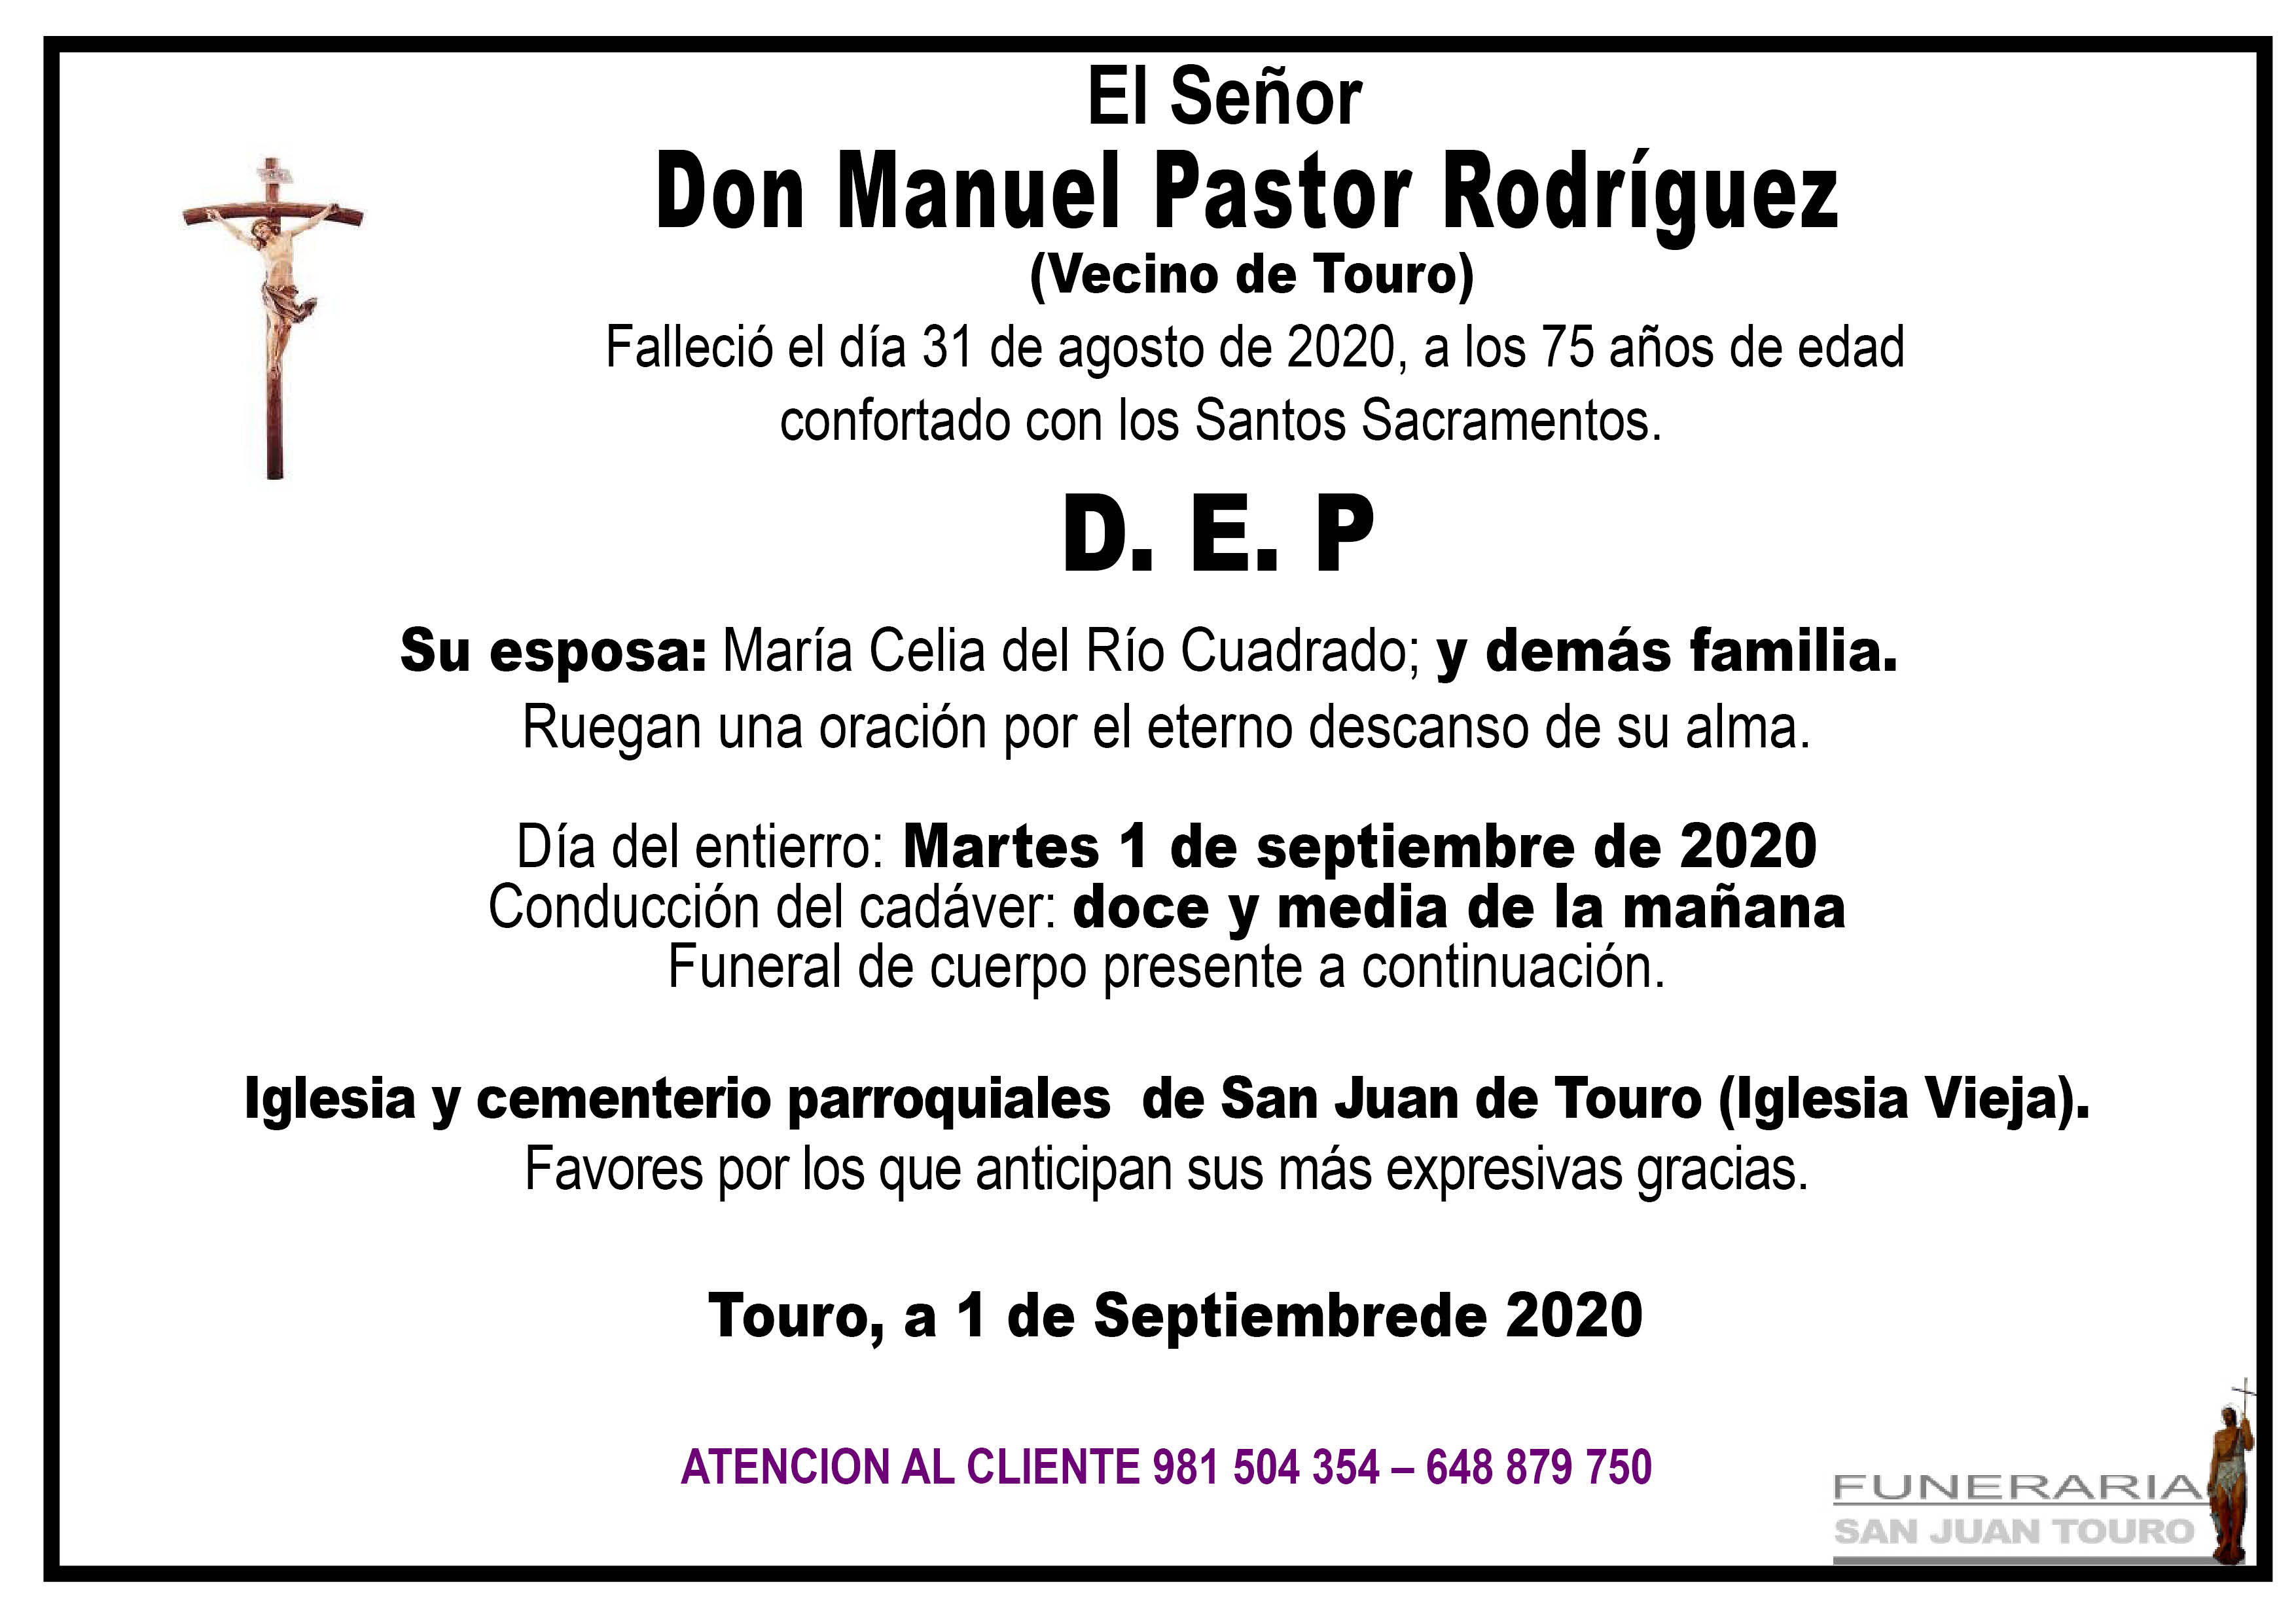 Esquela de SEPELIO DE DON MANUEL PASTOR RODRÍGUEZ